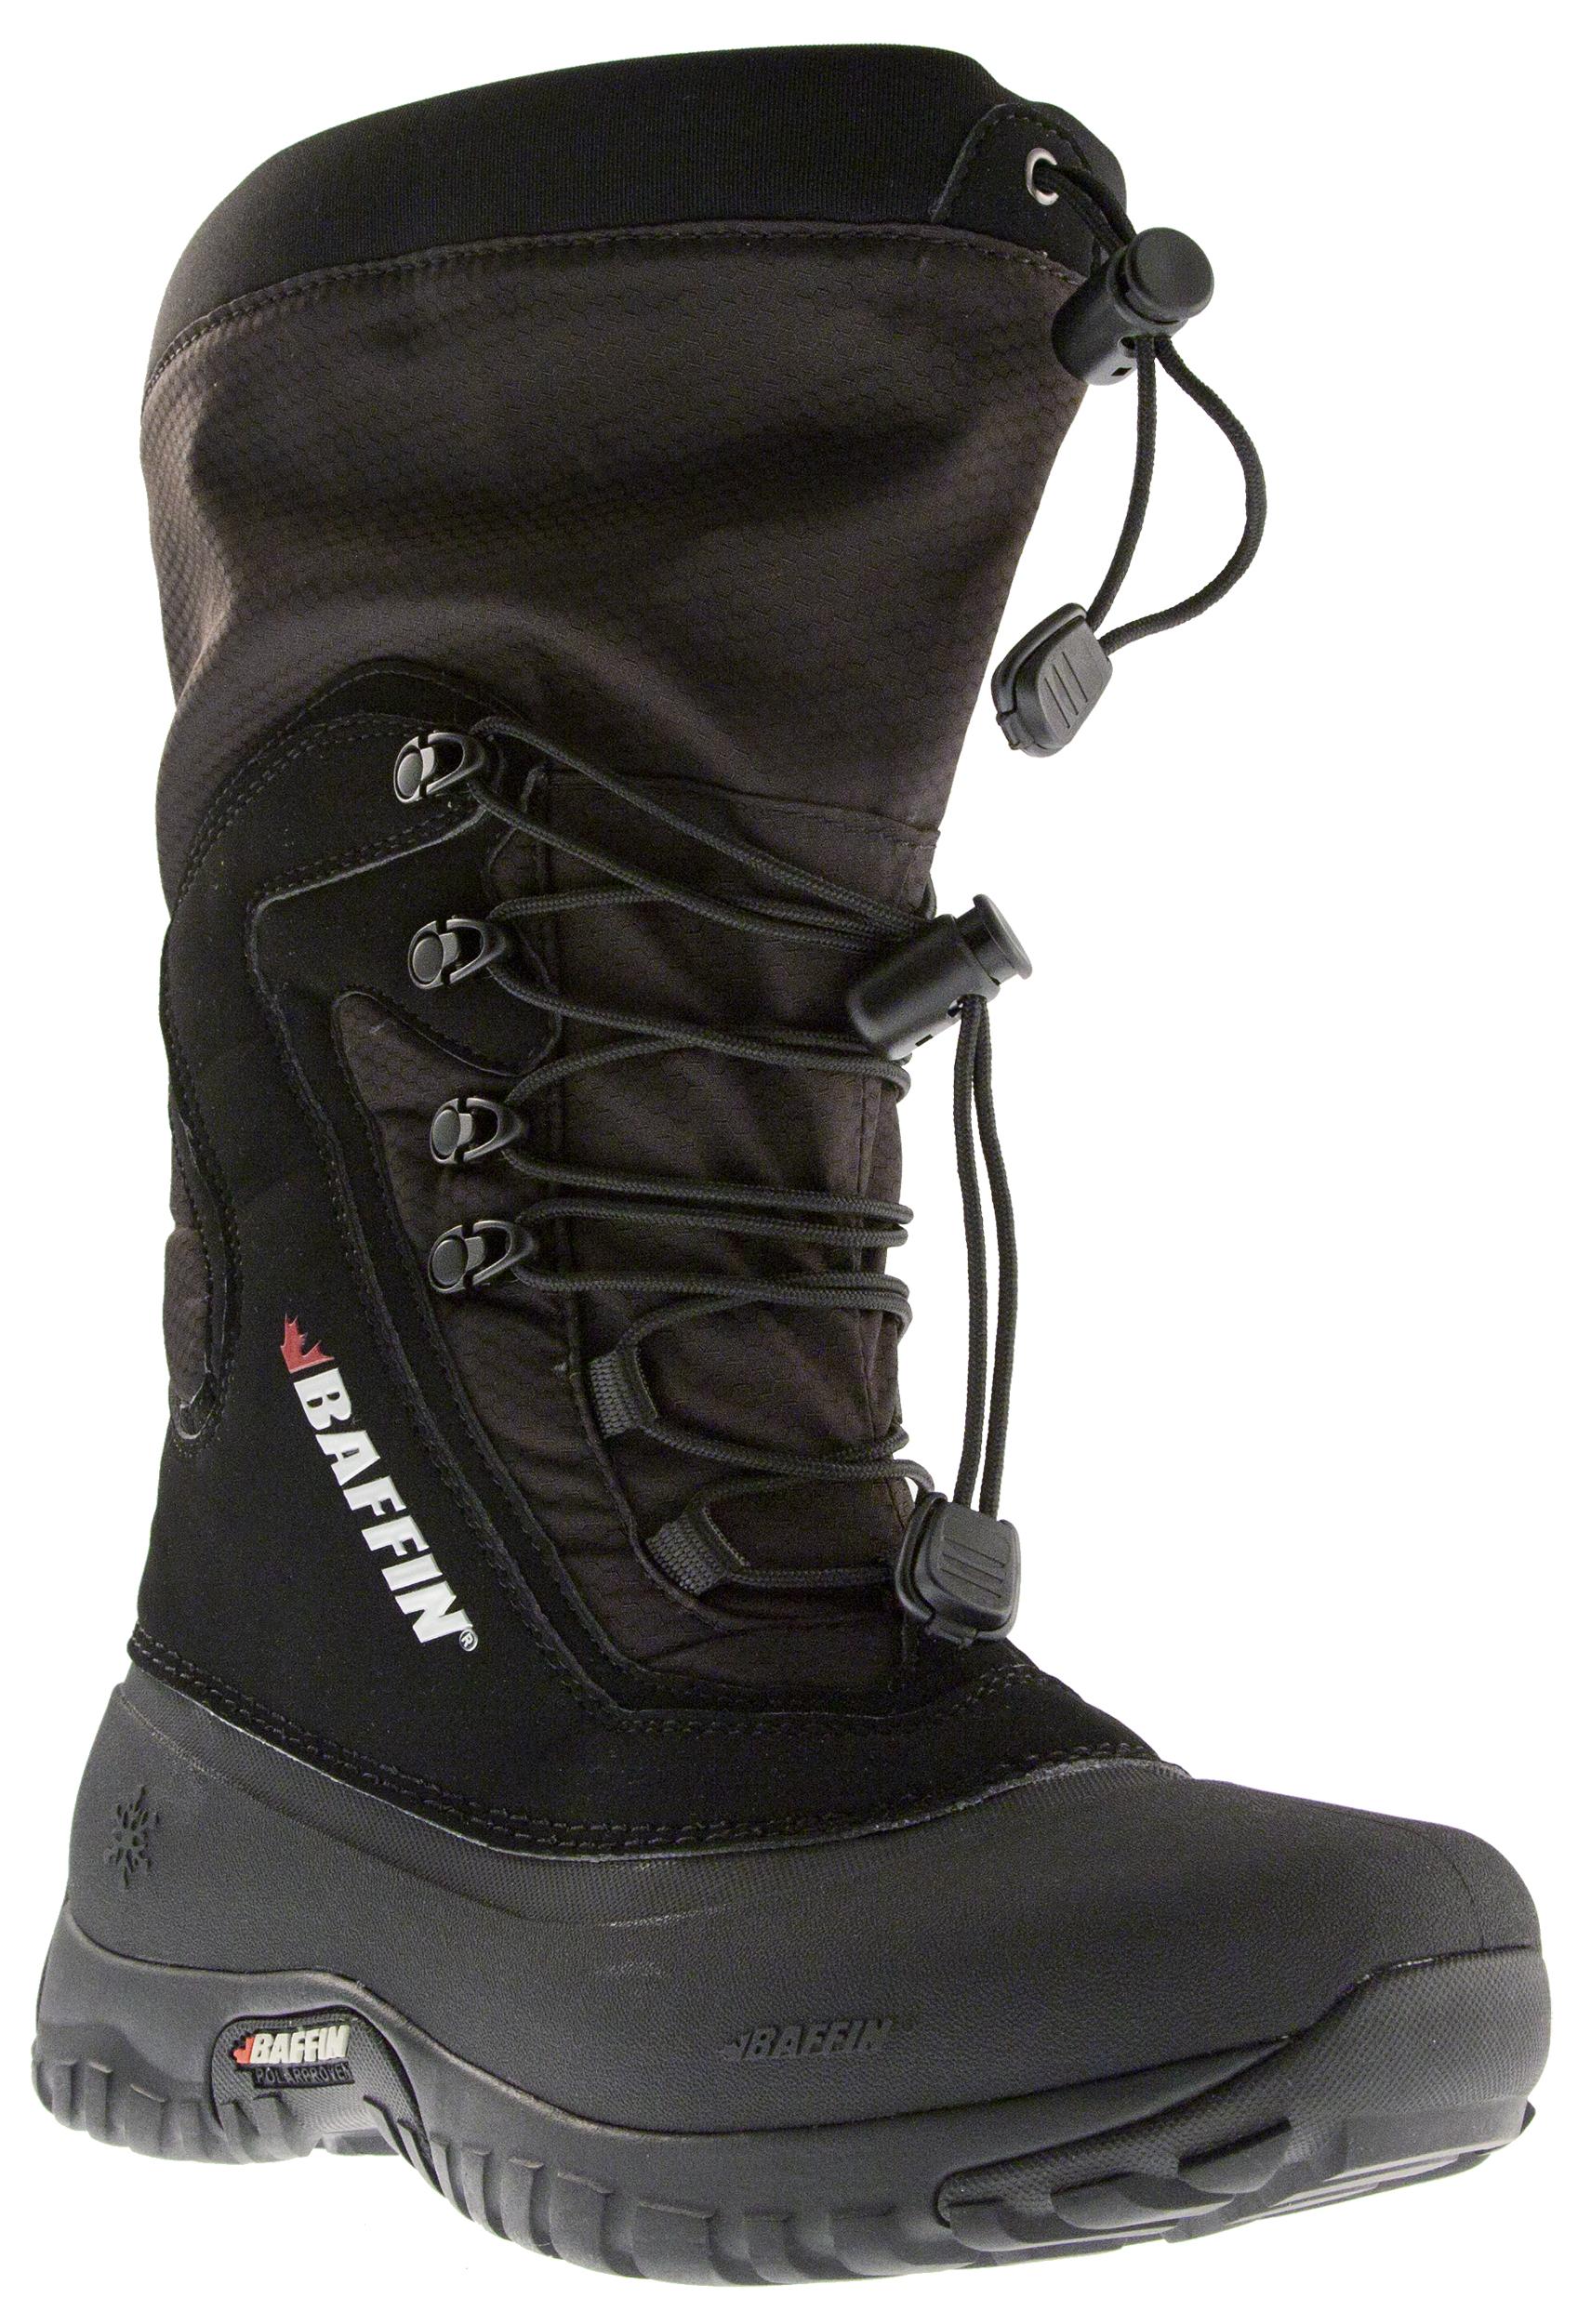 5181cbda4 Baffin Flare Winter Boots - Women's